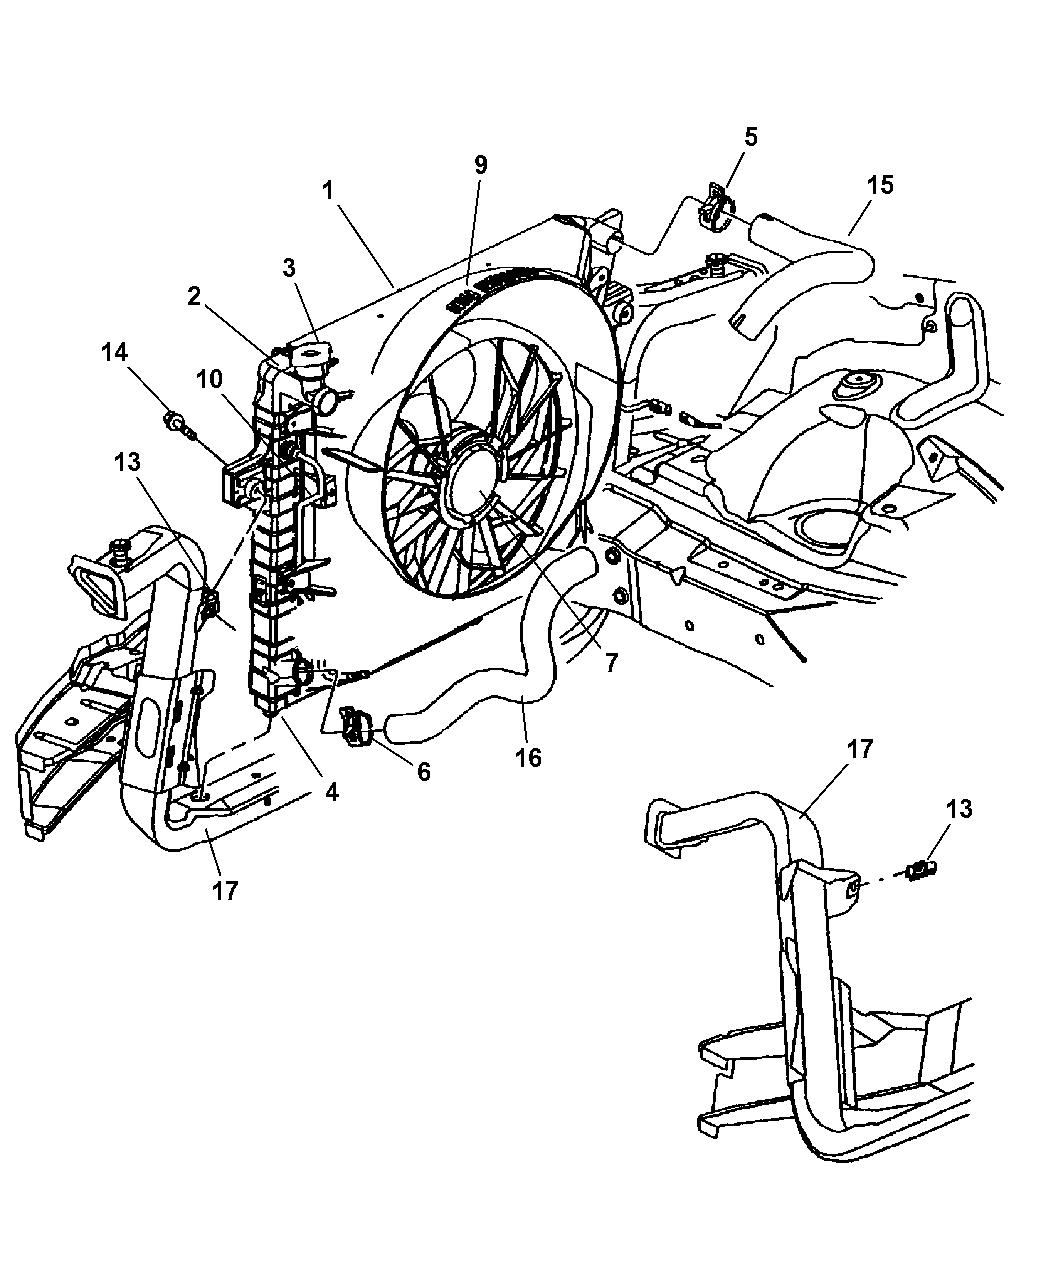 2000 Jeep Grand Cherokee Radiator U0026 Related Parts   Thumbnail 1